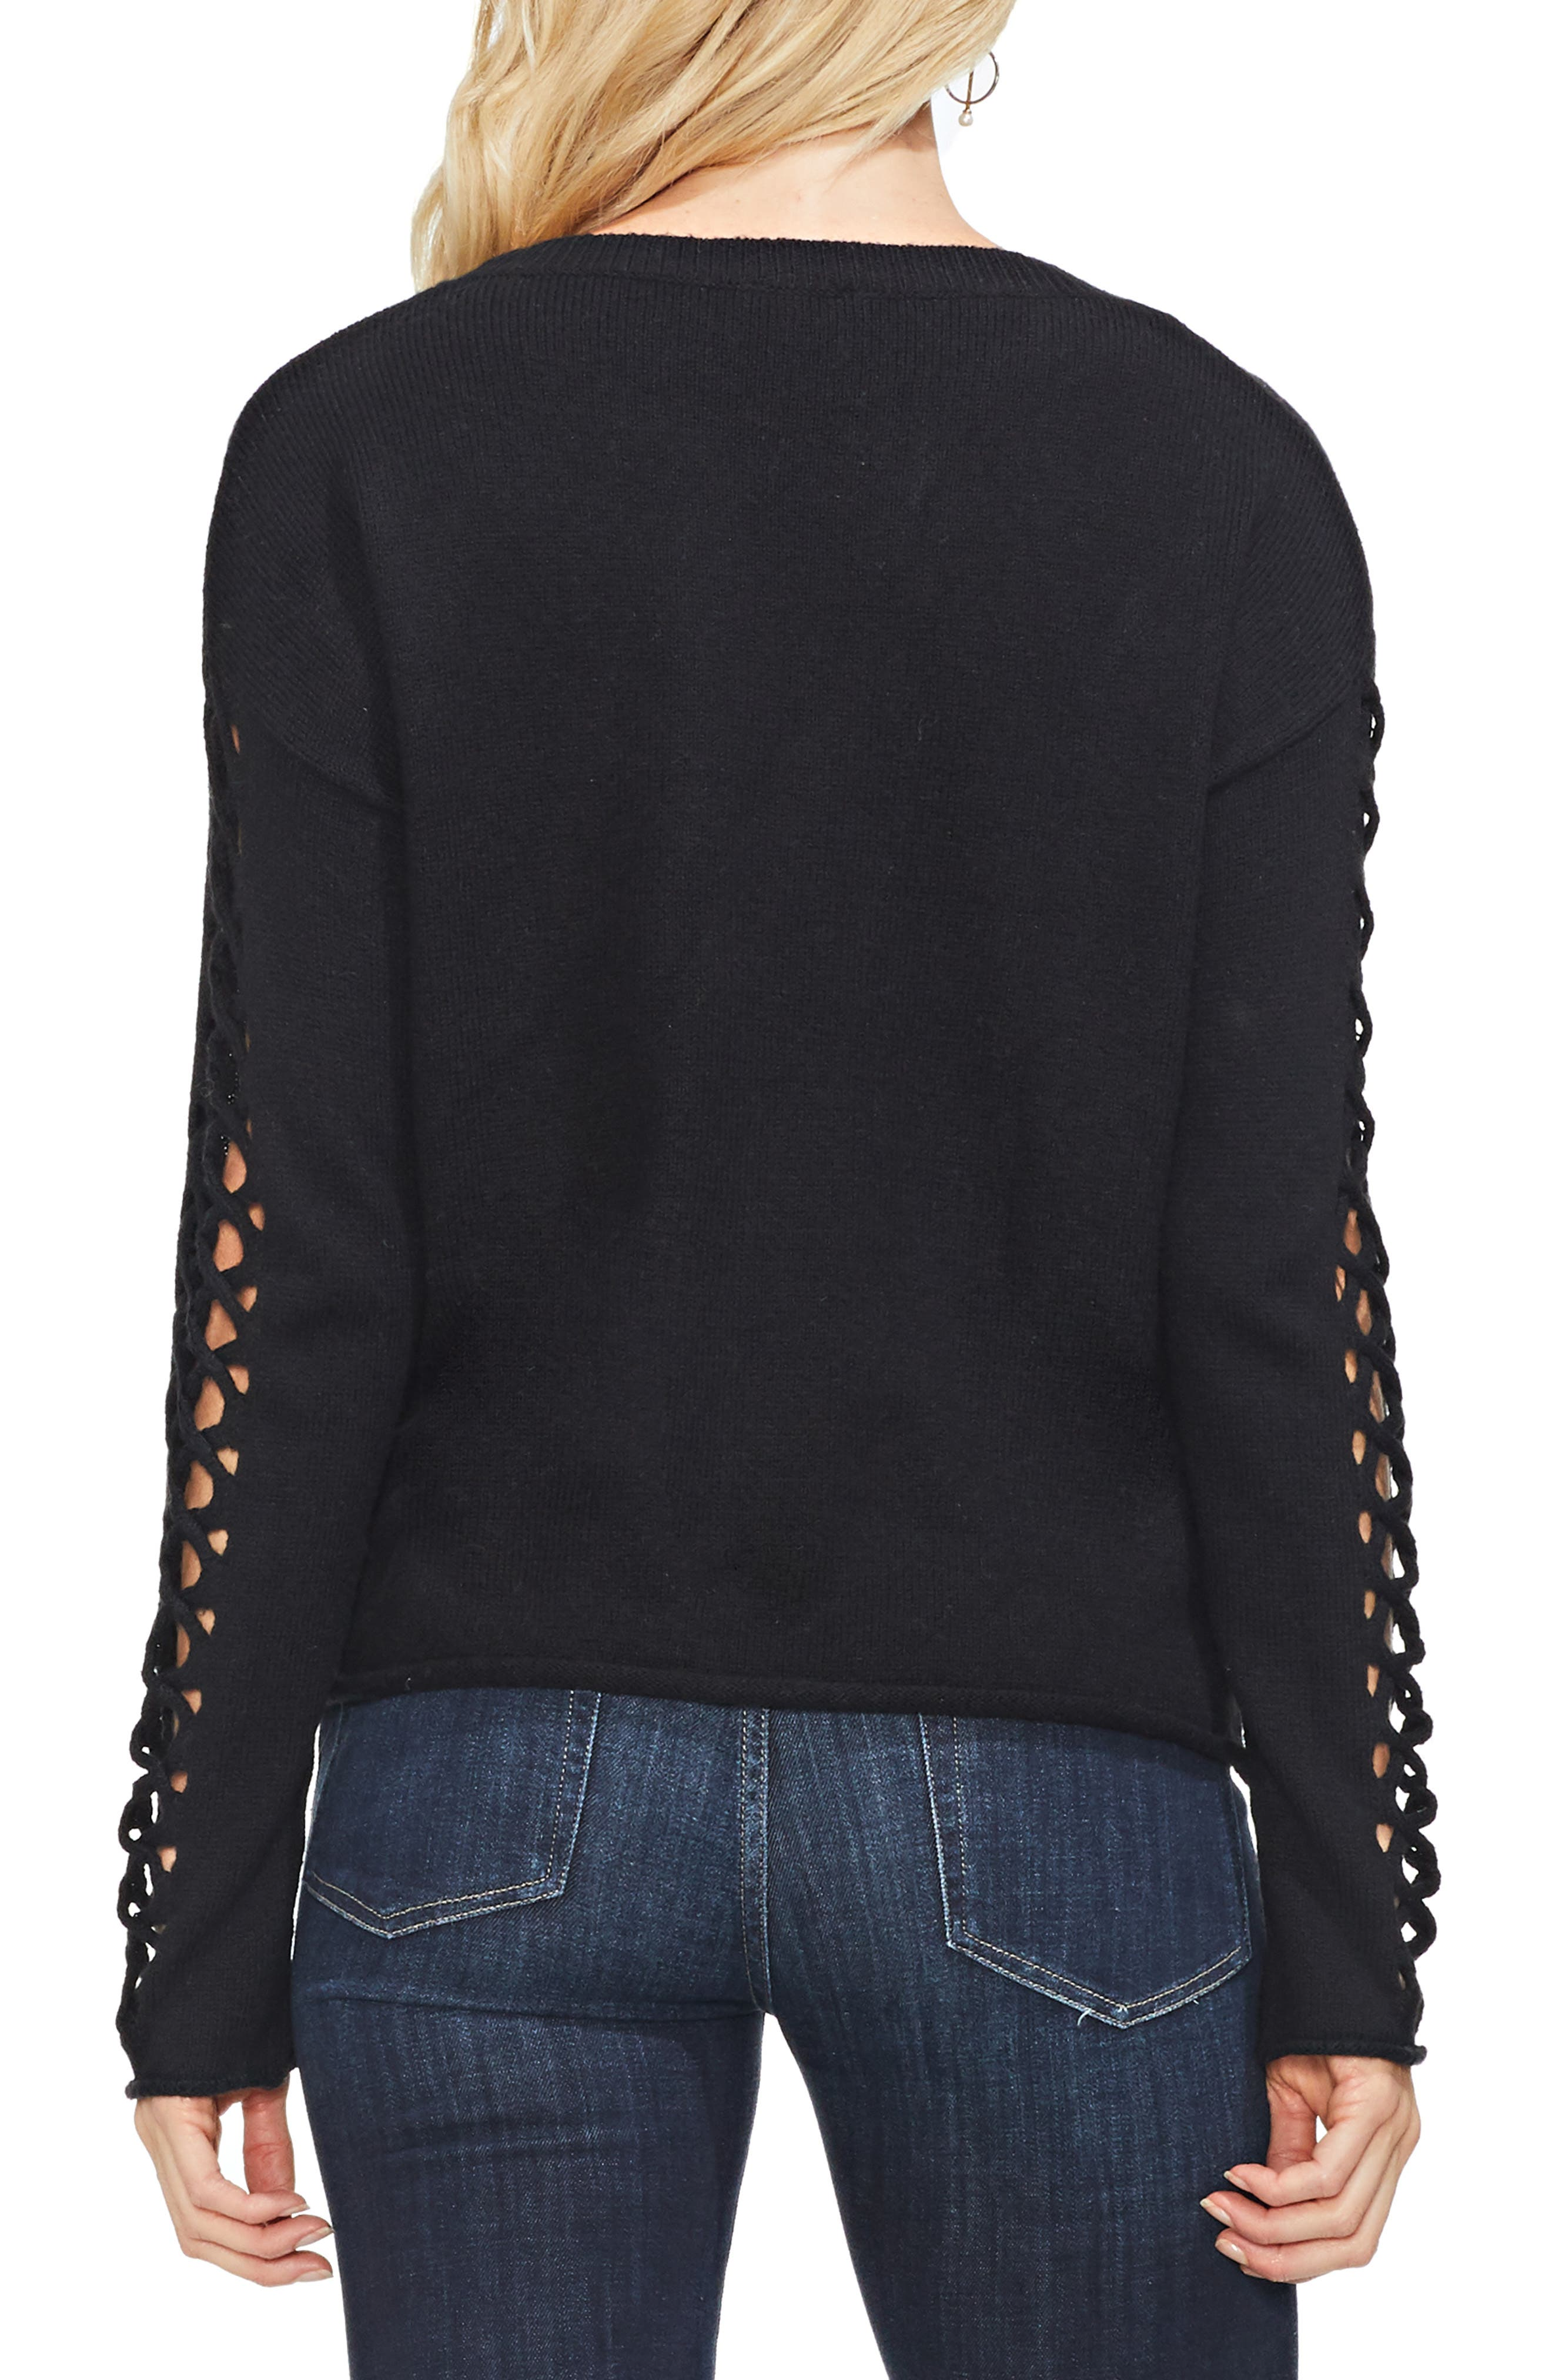 VINCE CAMUTO,                             Lattice Sleeve Cotton Blend Sweater,                             Alternate thumbnail 2, color,                             006